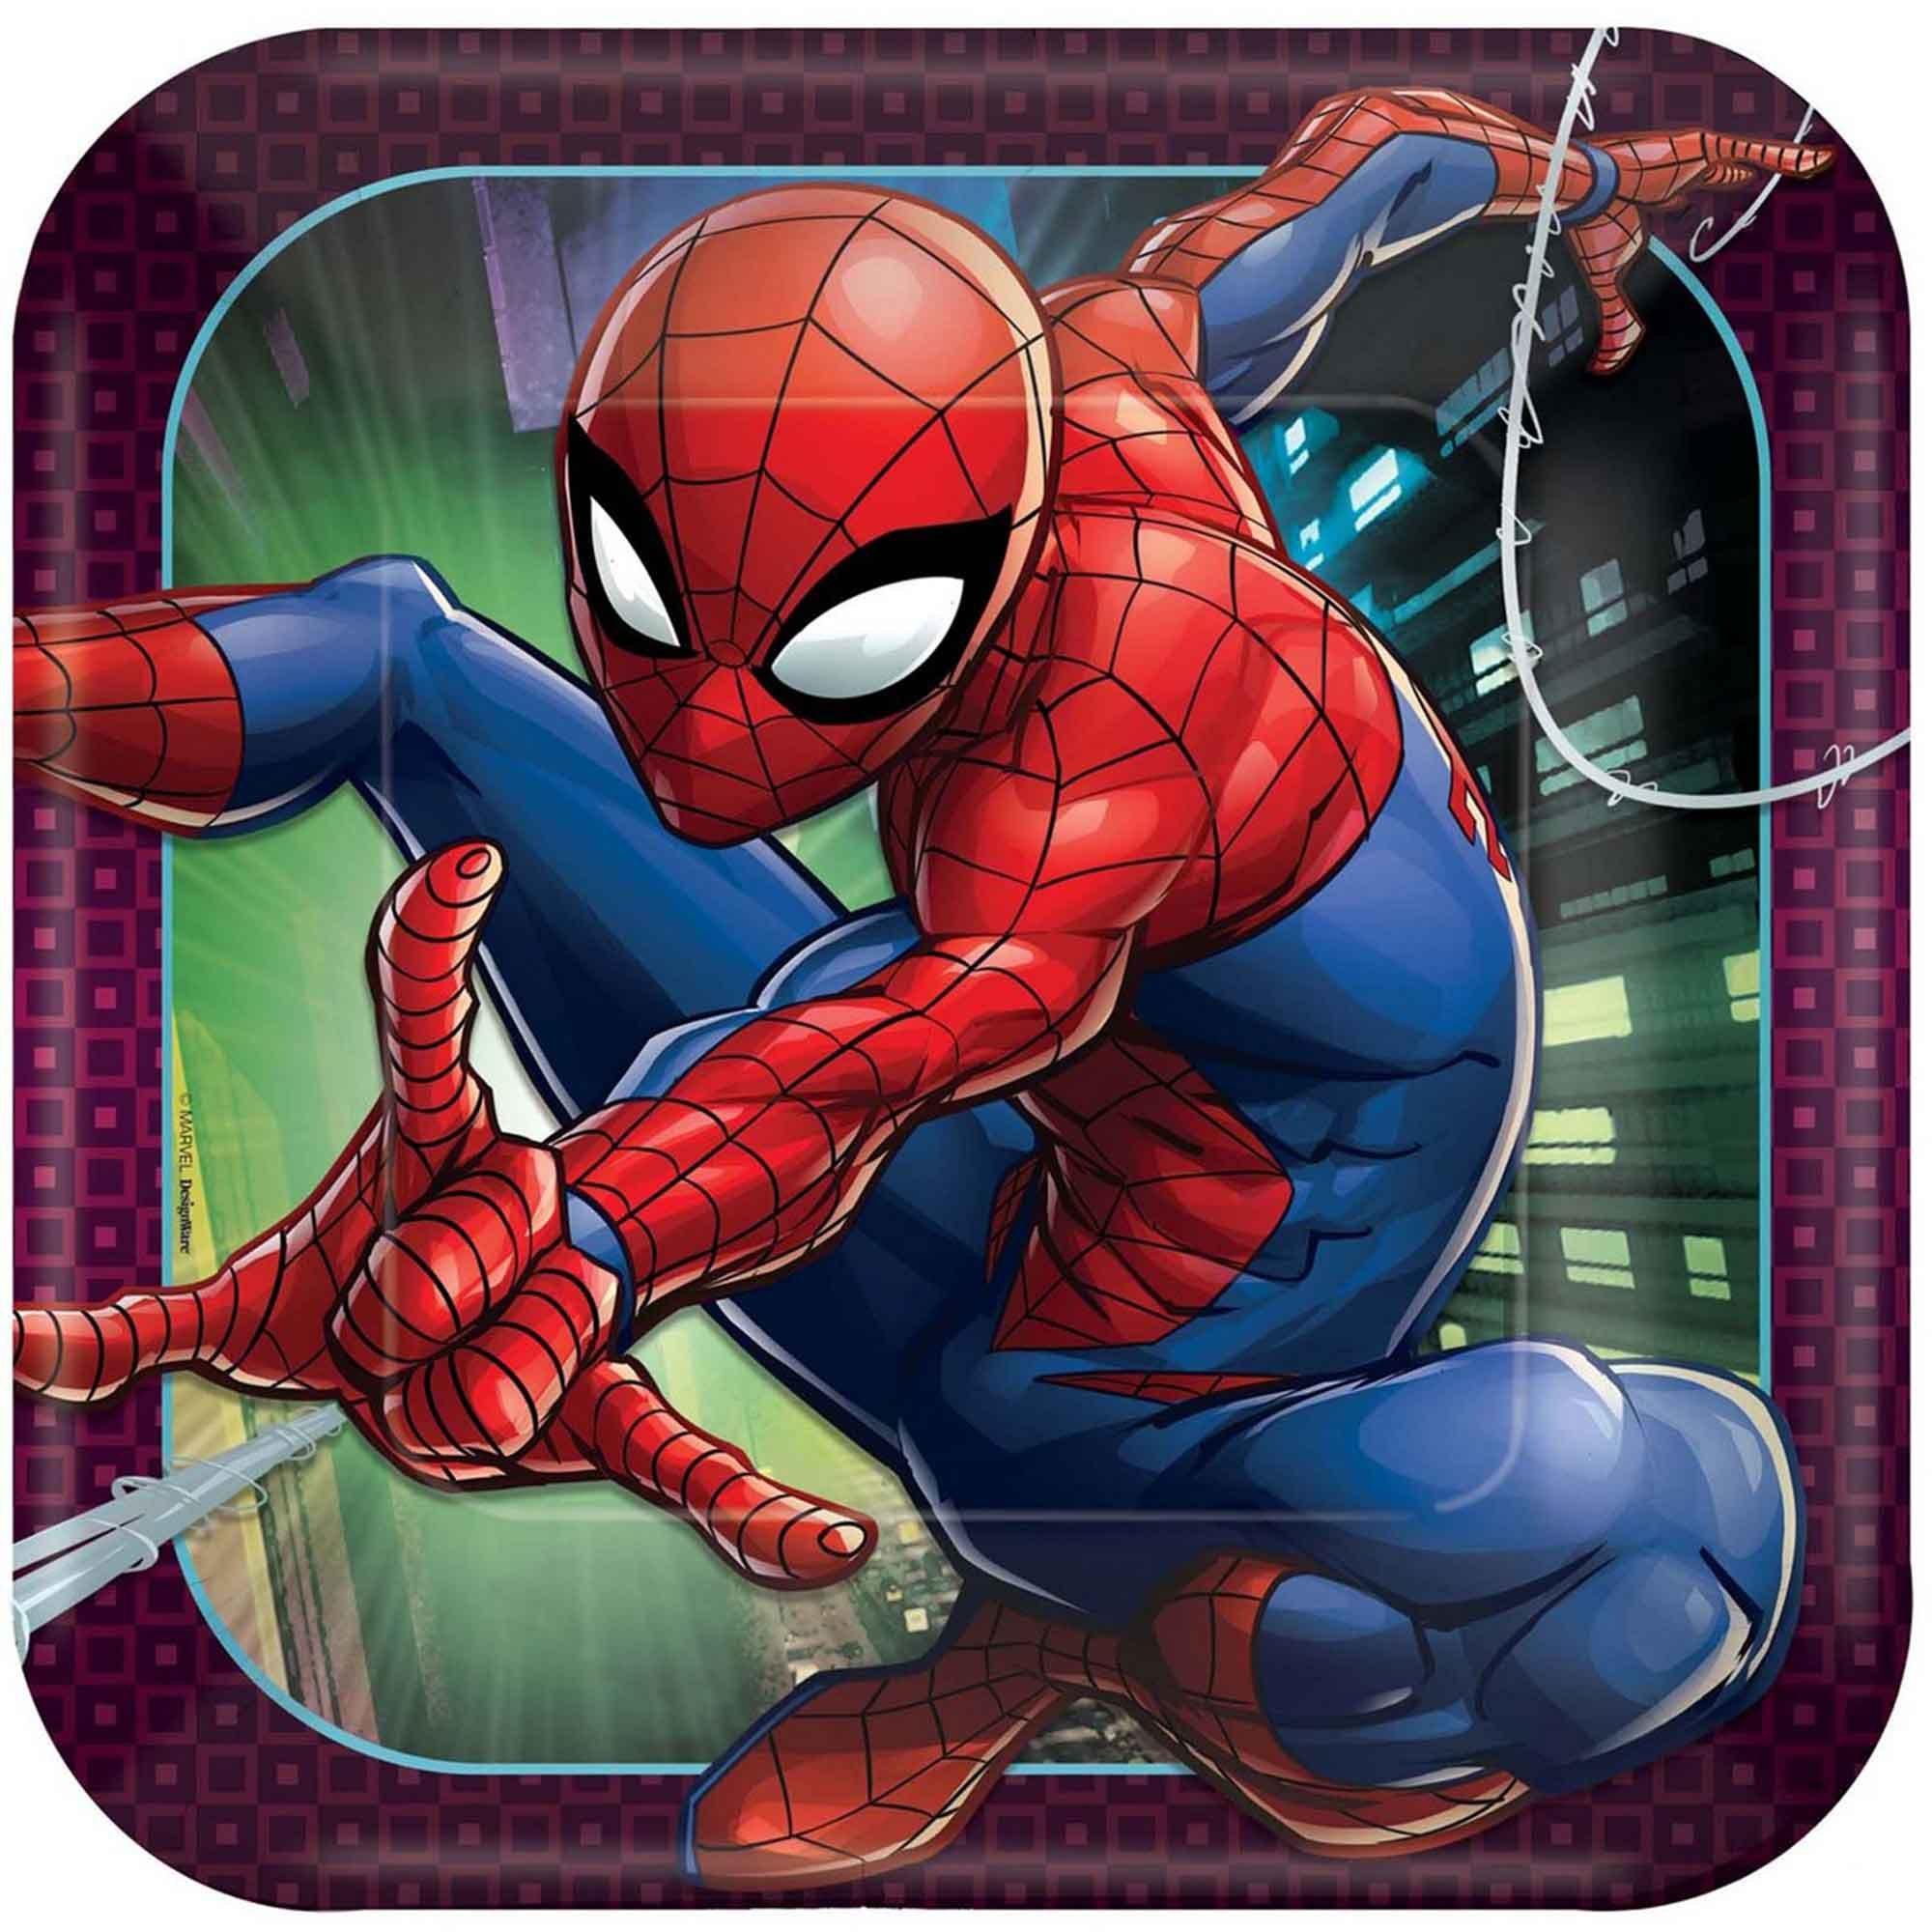 Spider-Man Webbed Wonder 23cm Square Plates